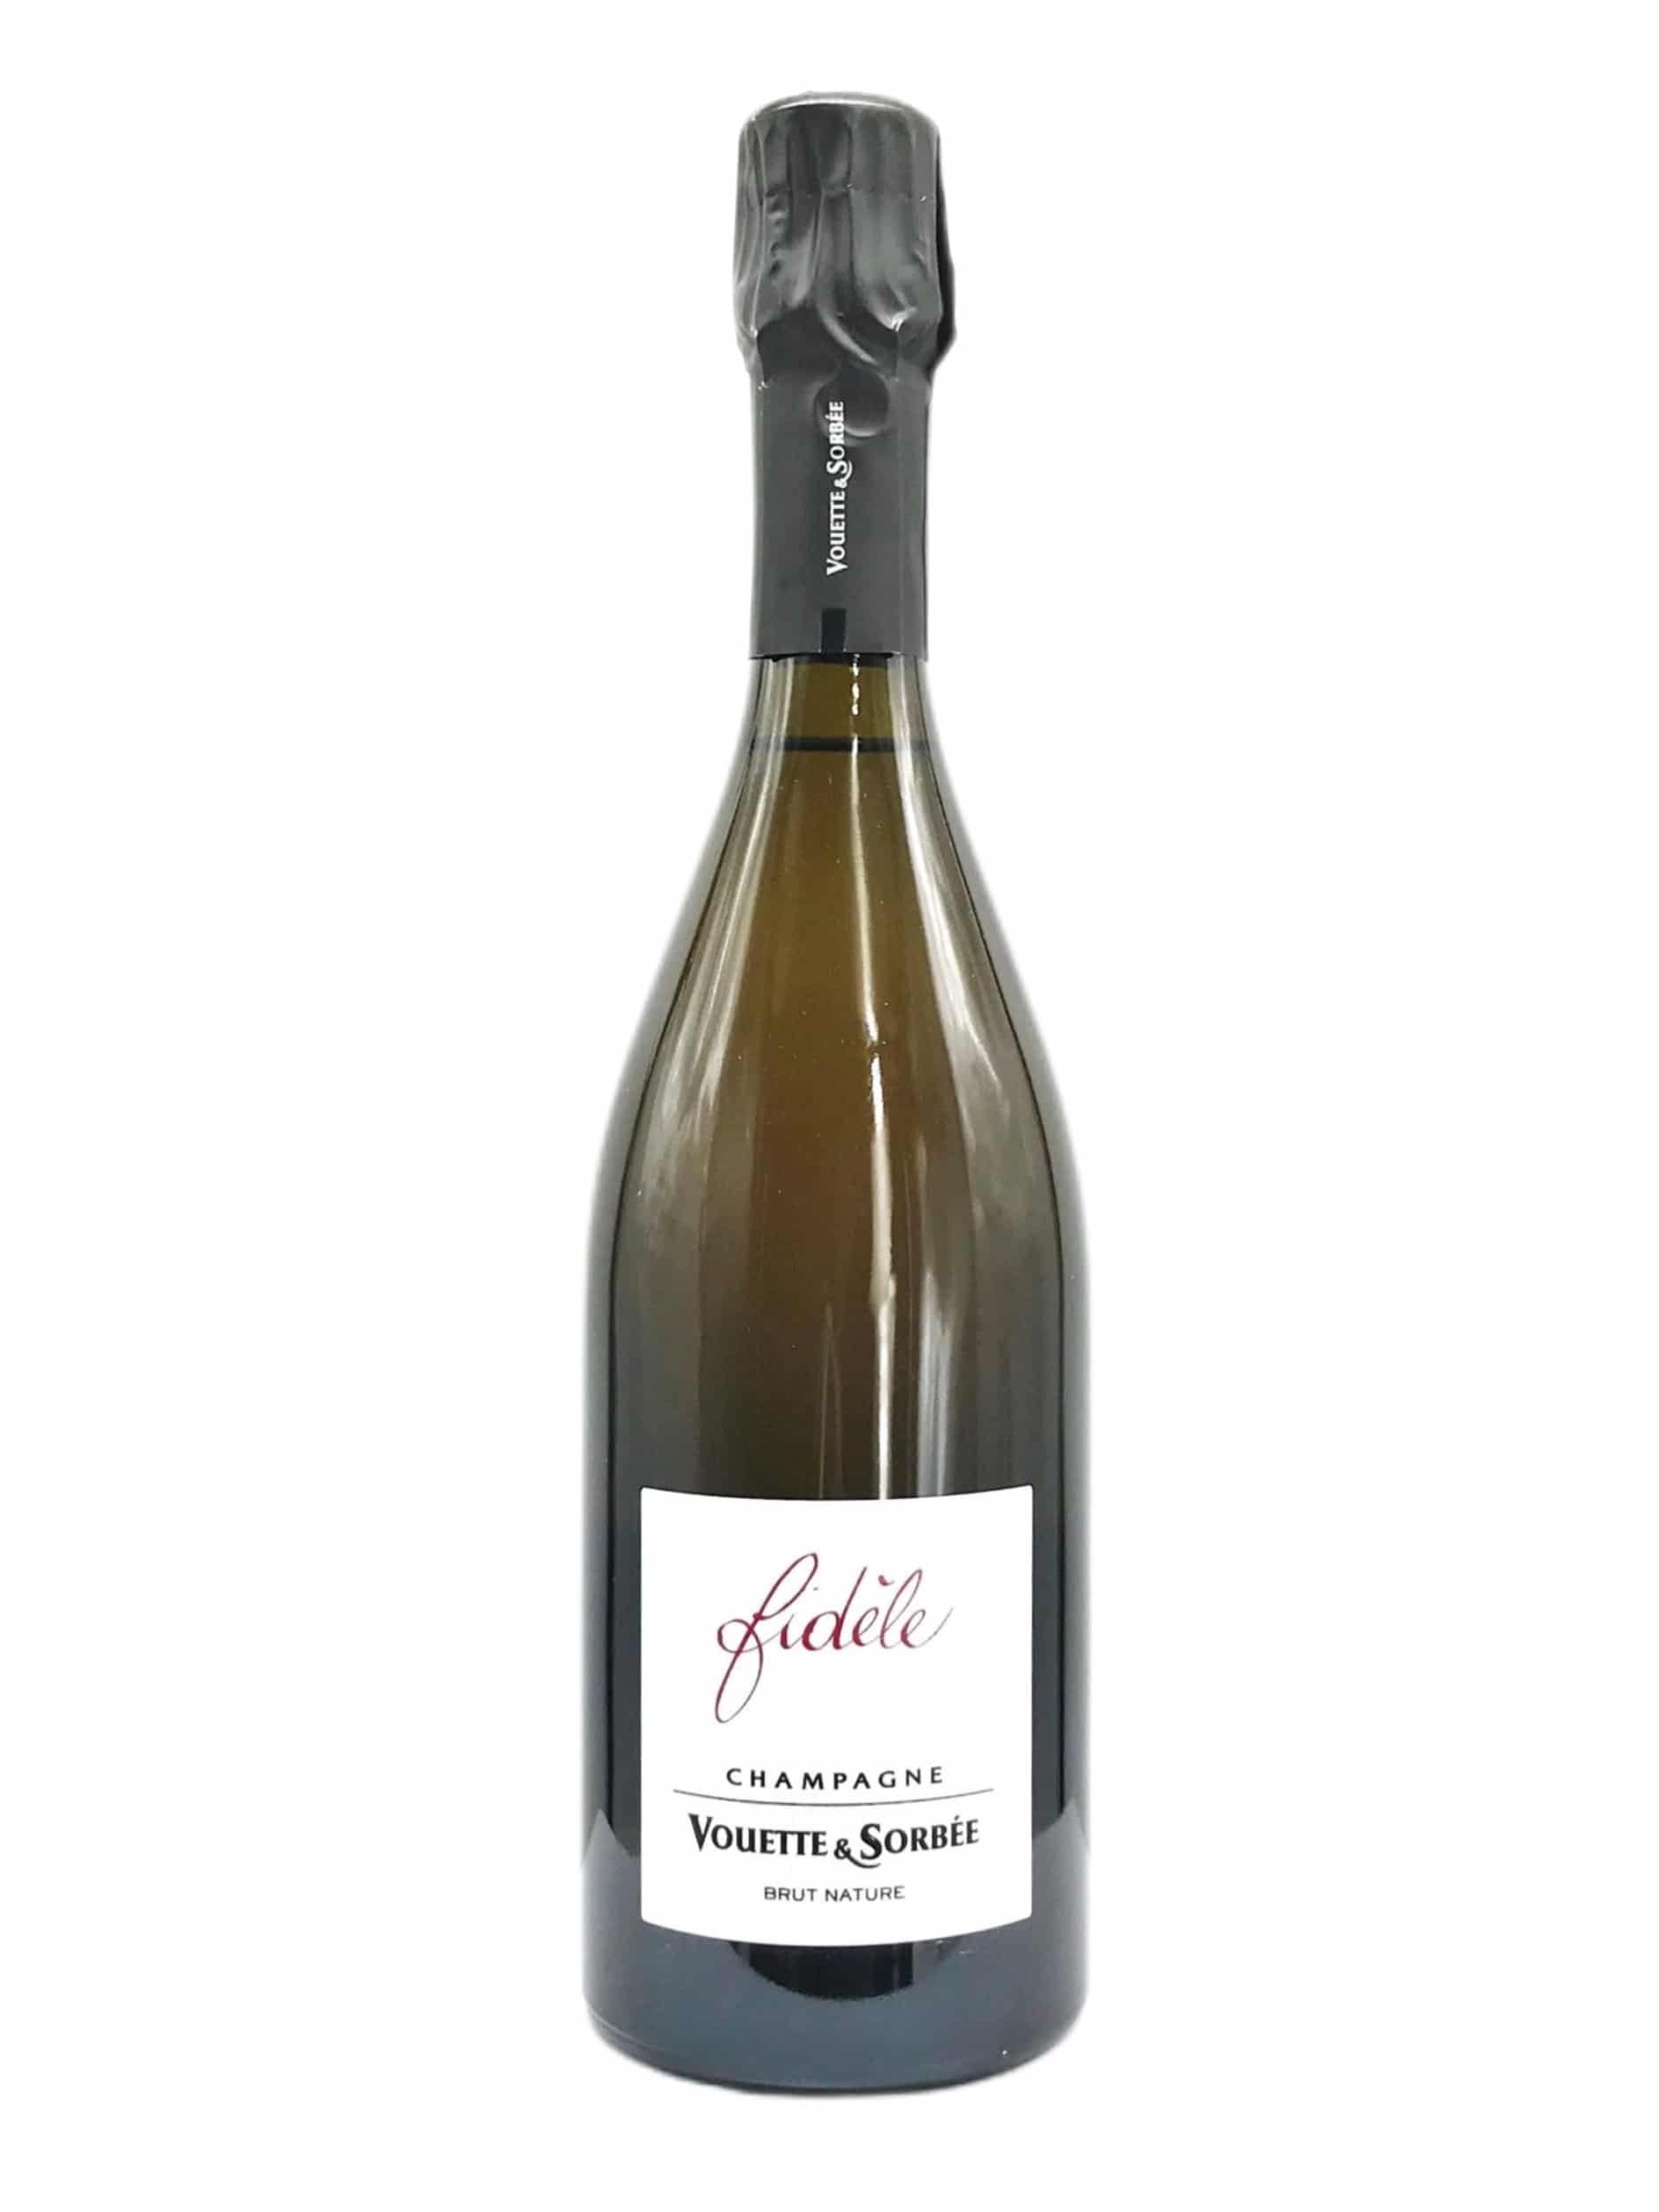 Champagne Vouette & Sorbee Fidele